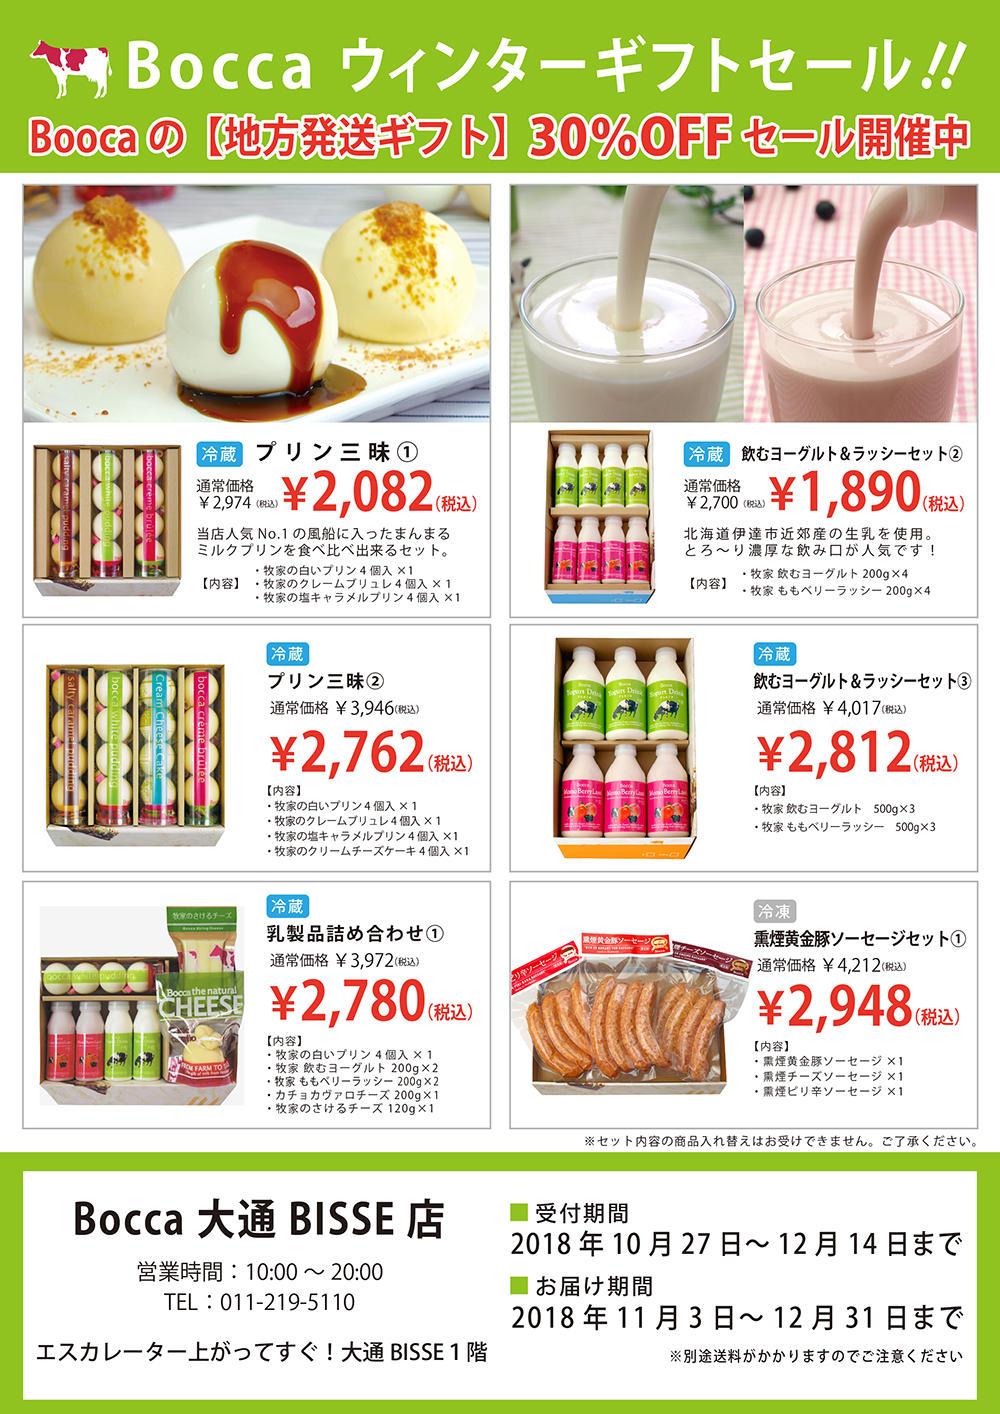 https://www.odori-bisse.com/bocca_181023_img.jpg